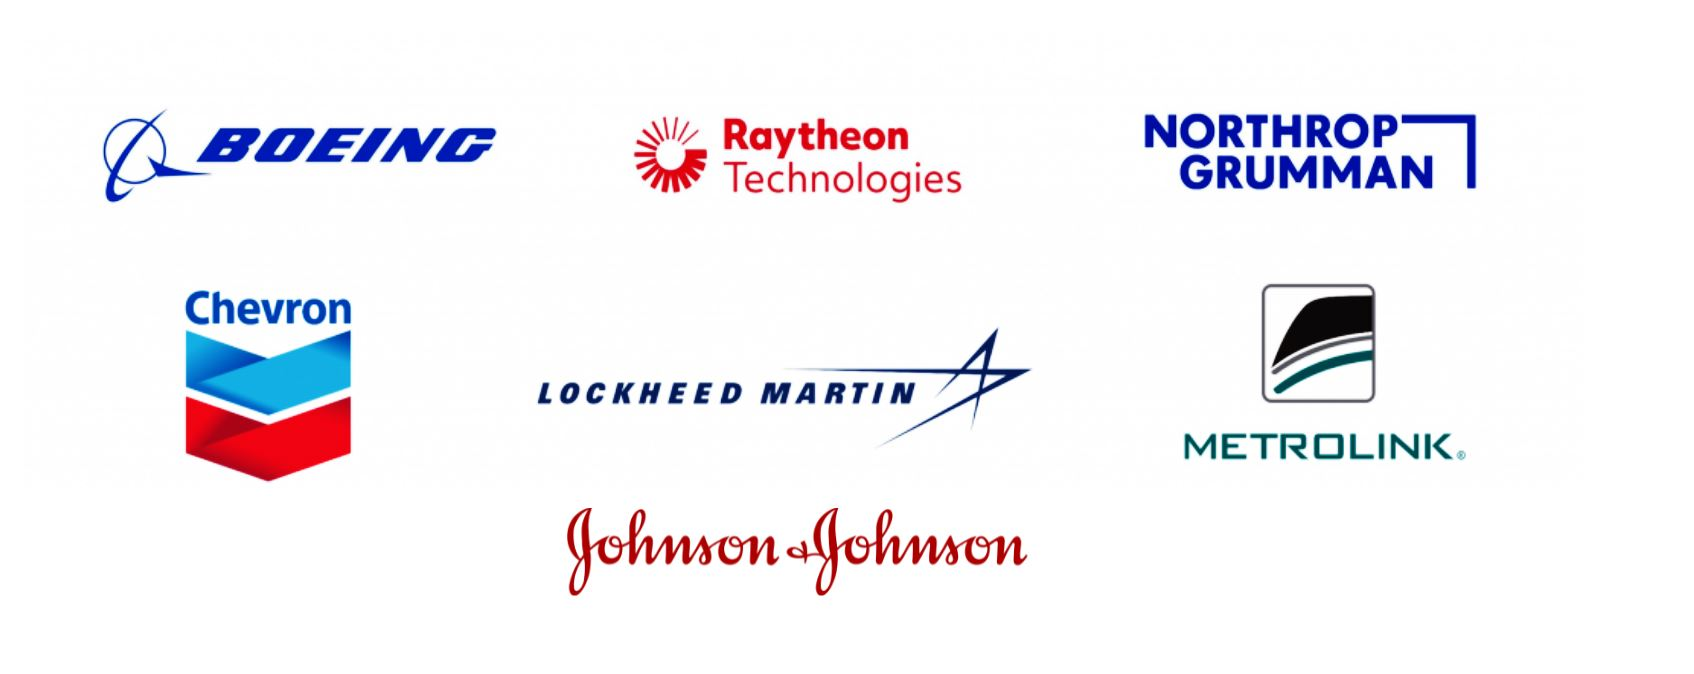 Boeing, Raytheon Technologies, Northrop Grumman, Chevron, Google, Lockheed Martin, Metrolink